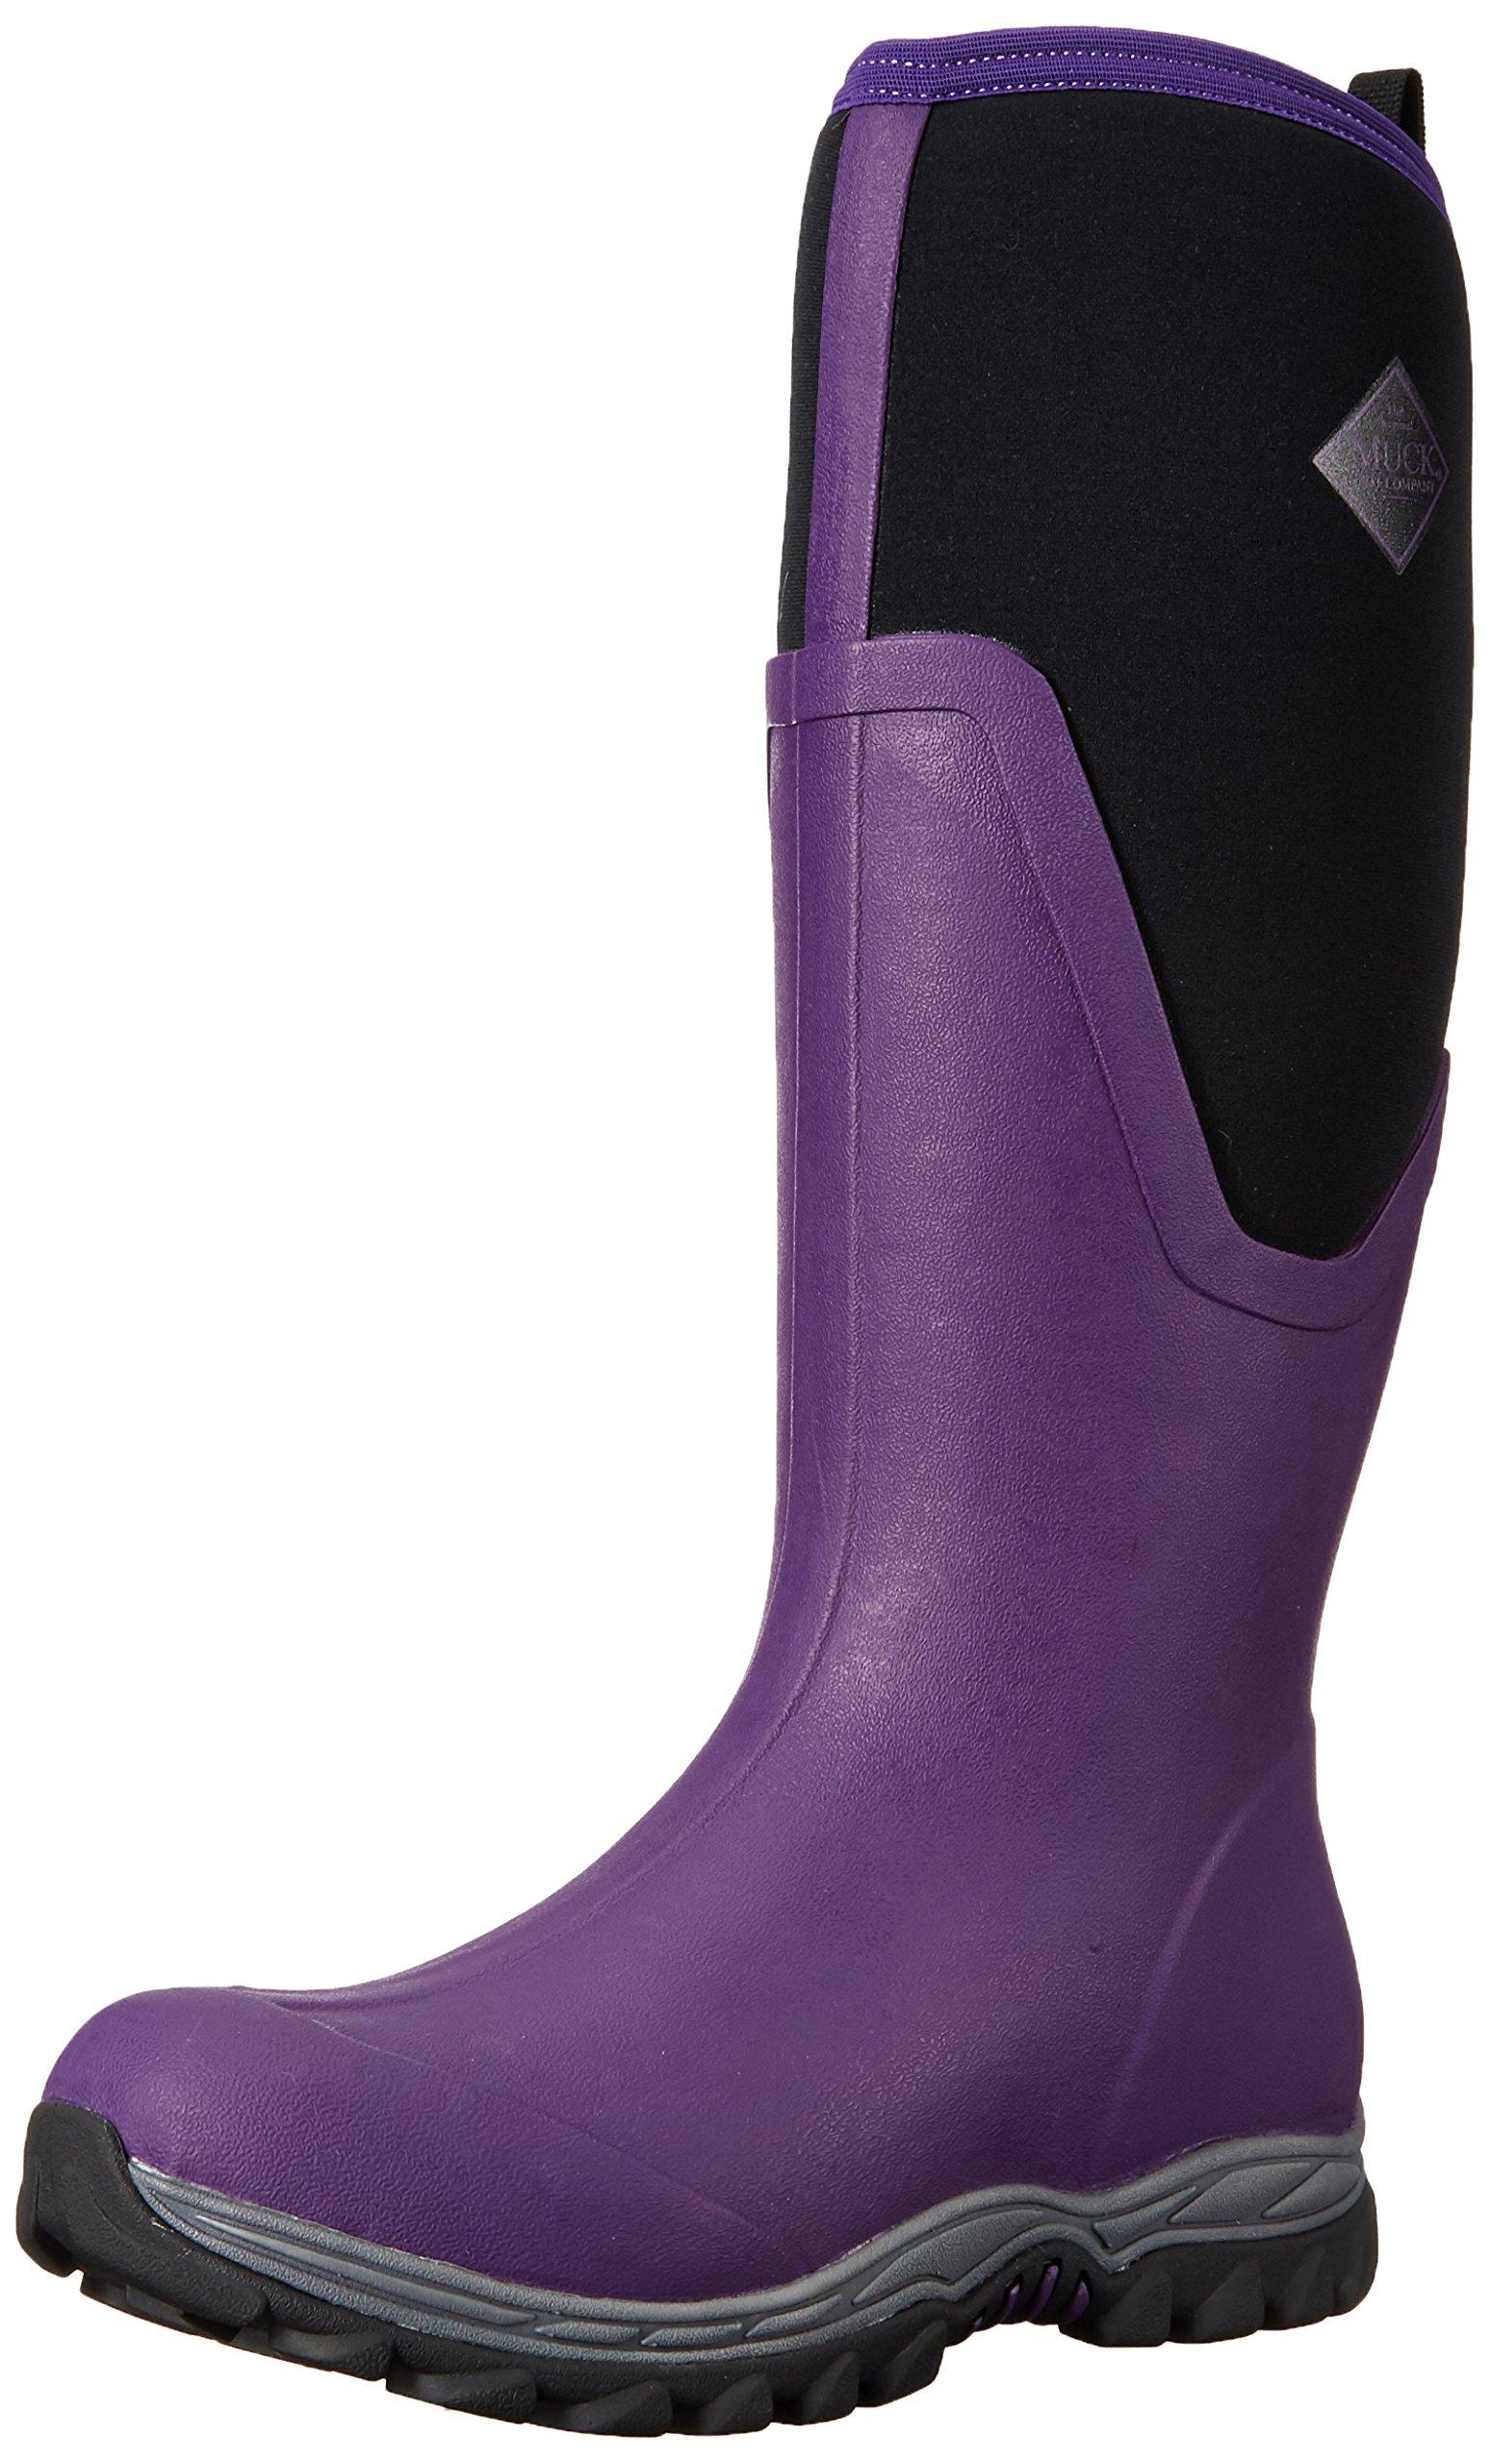 Boots Ii Arctic De Sport Eu Pluie Muck TallBottesamp; FemmeBleuacai42 Bottines nv0yNwP8Om